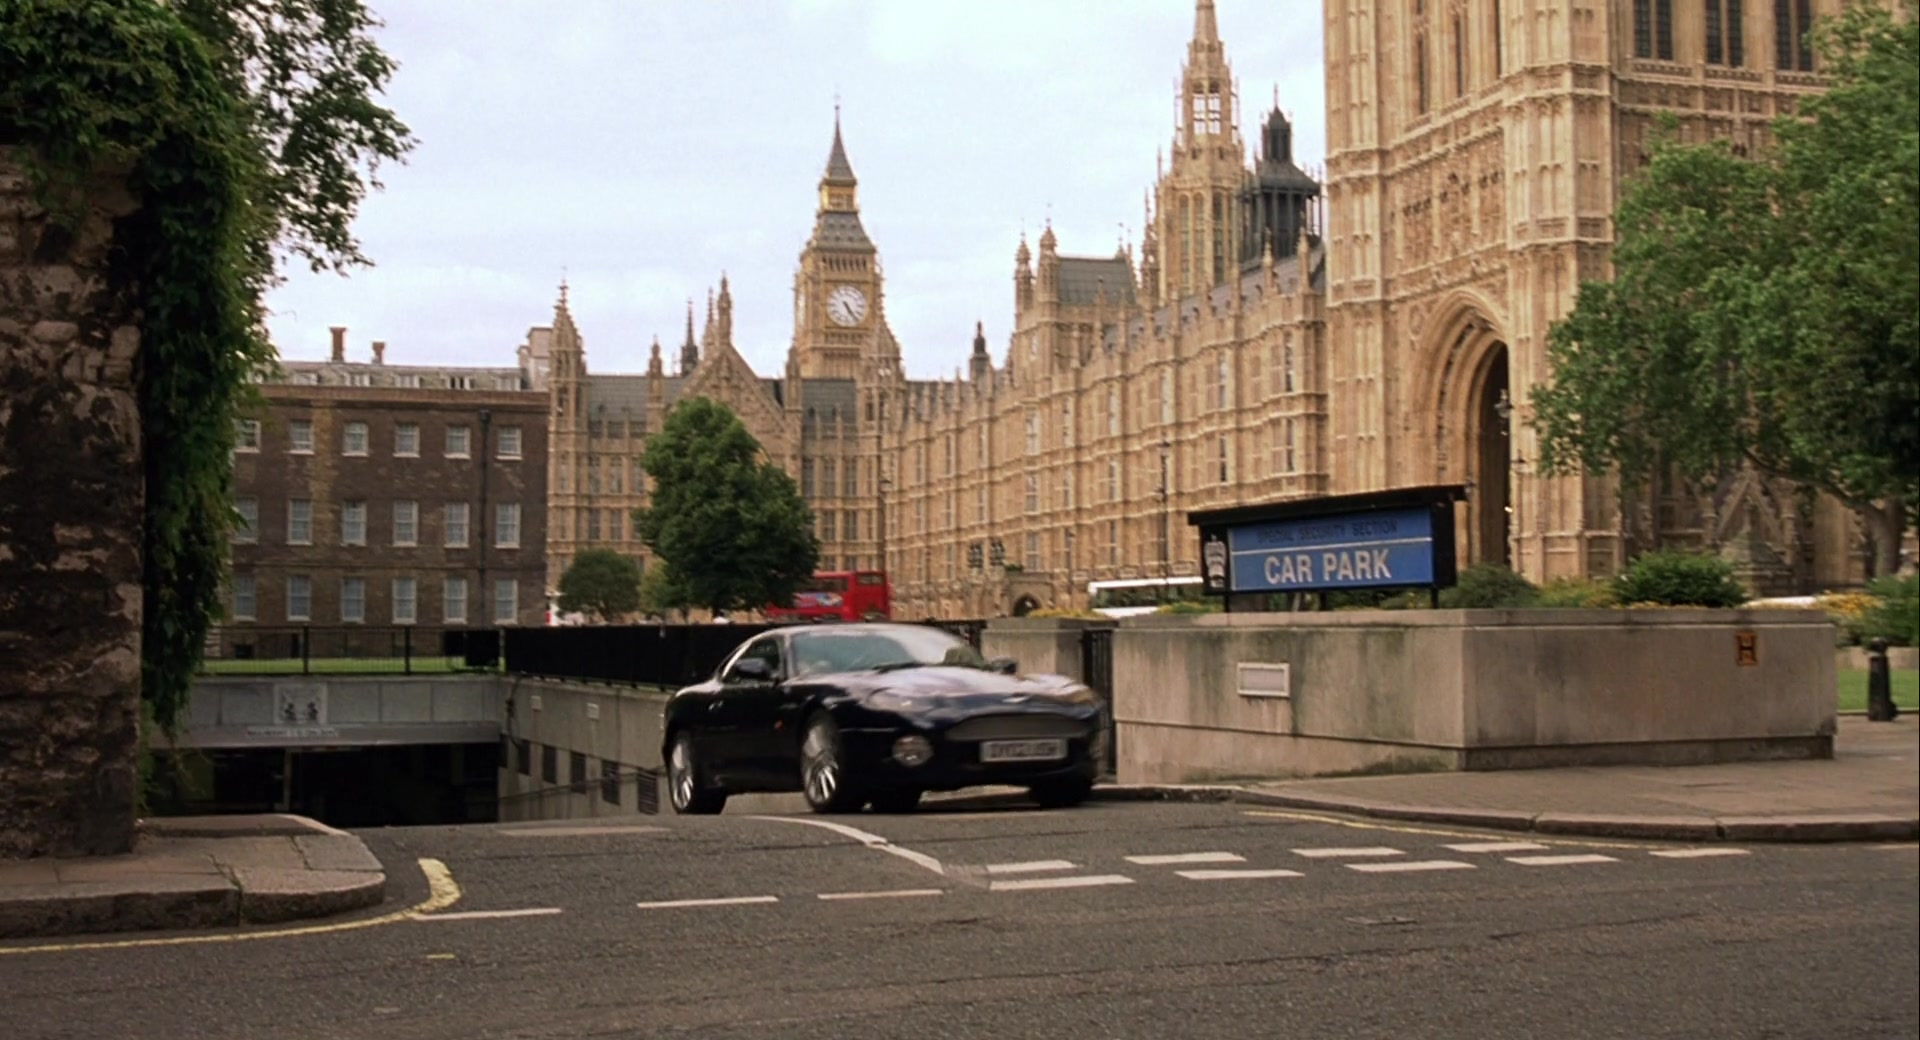 Aston Martin Db7 Vantage Sports Car Used By Rowan Atkinson In Johnny